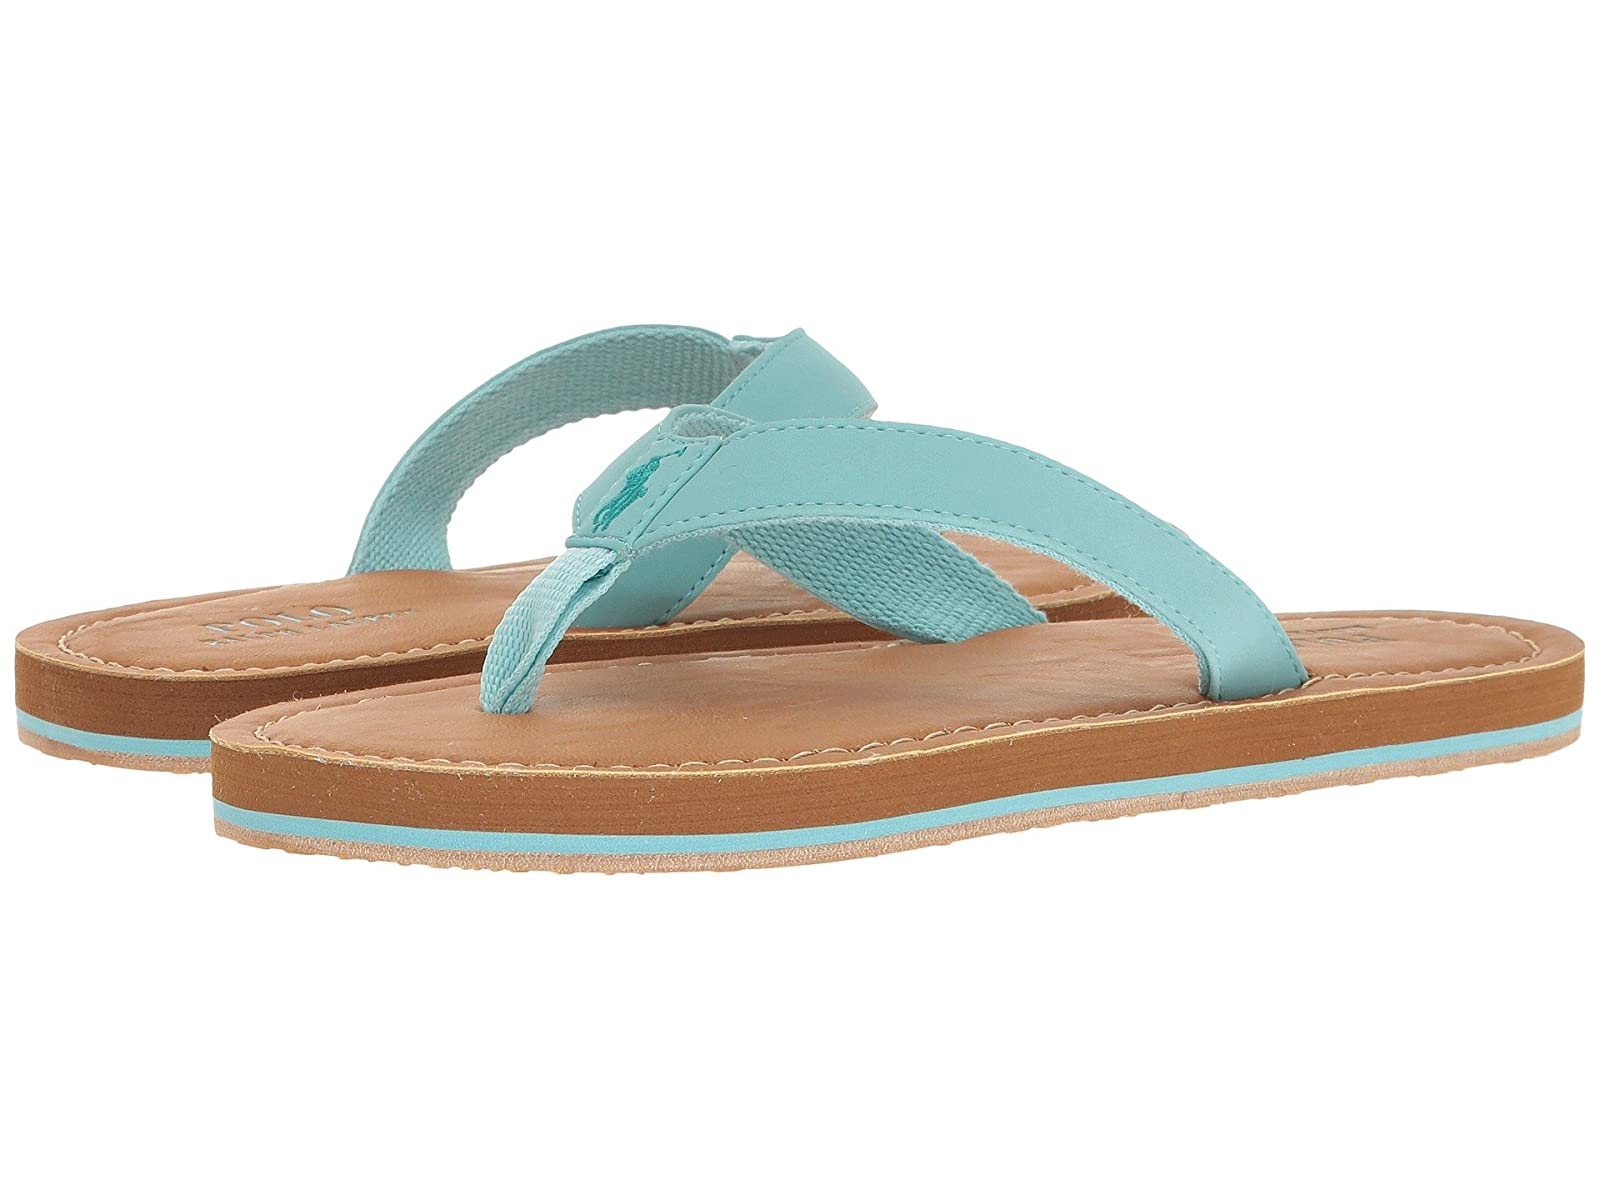 Polo Ralph Lauren Kids Lia (Big Kid)Atmospheric grades have affordable shoes